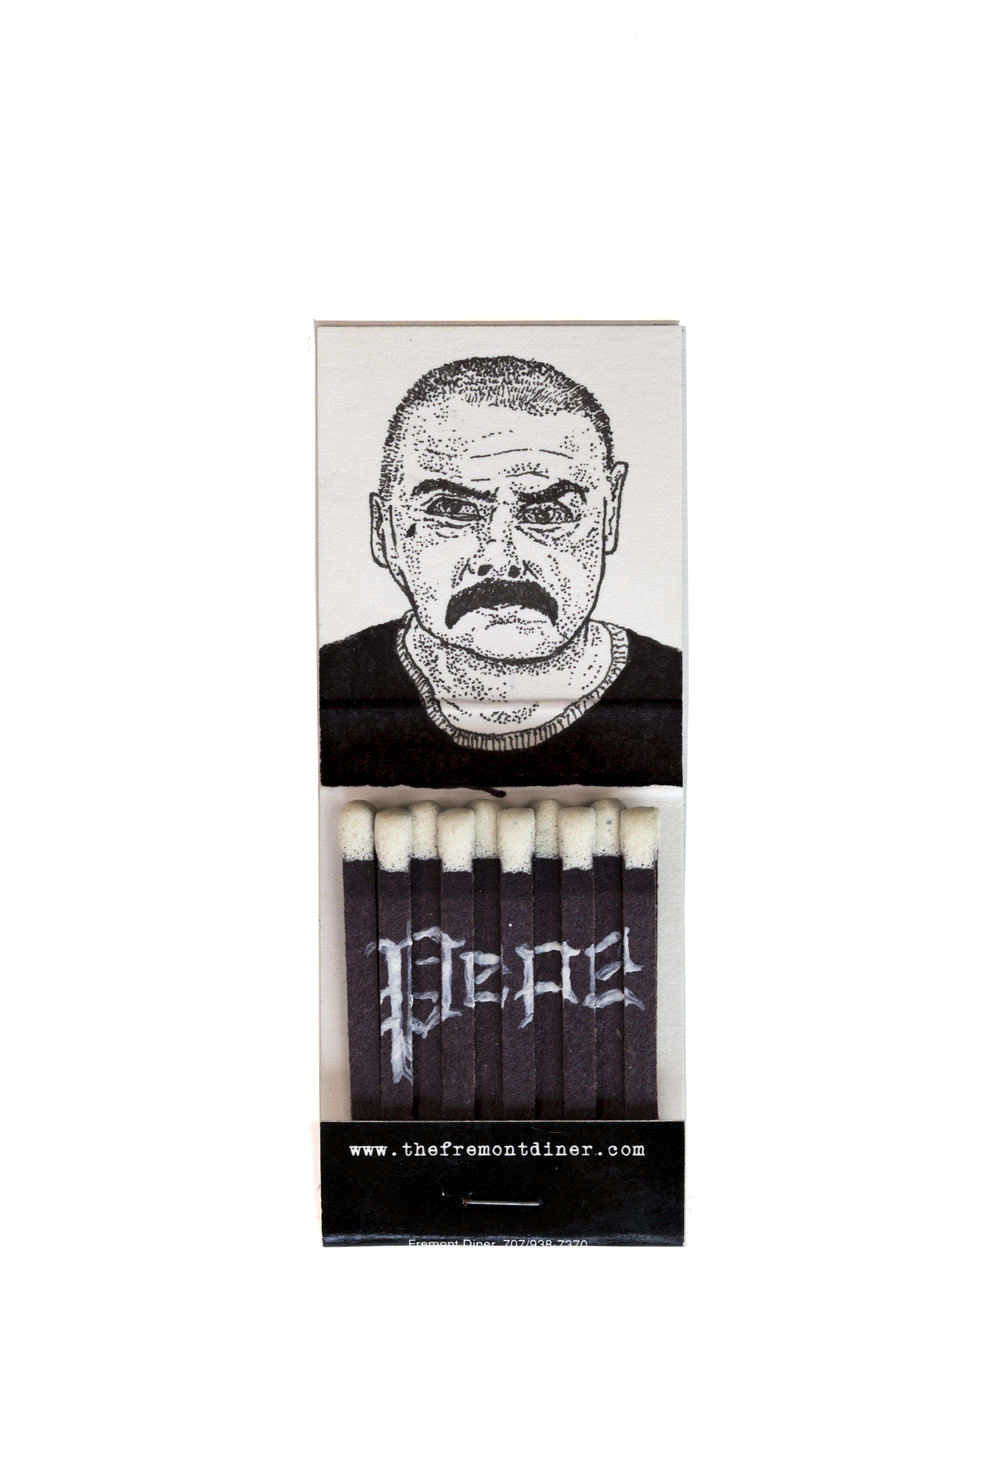 19. Pepe